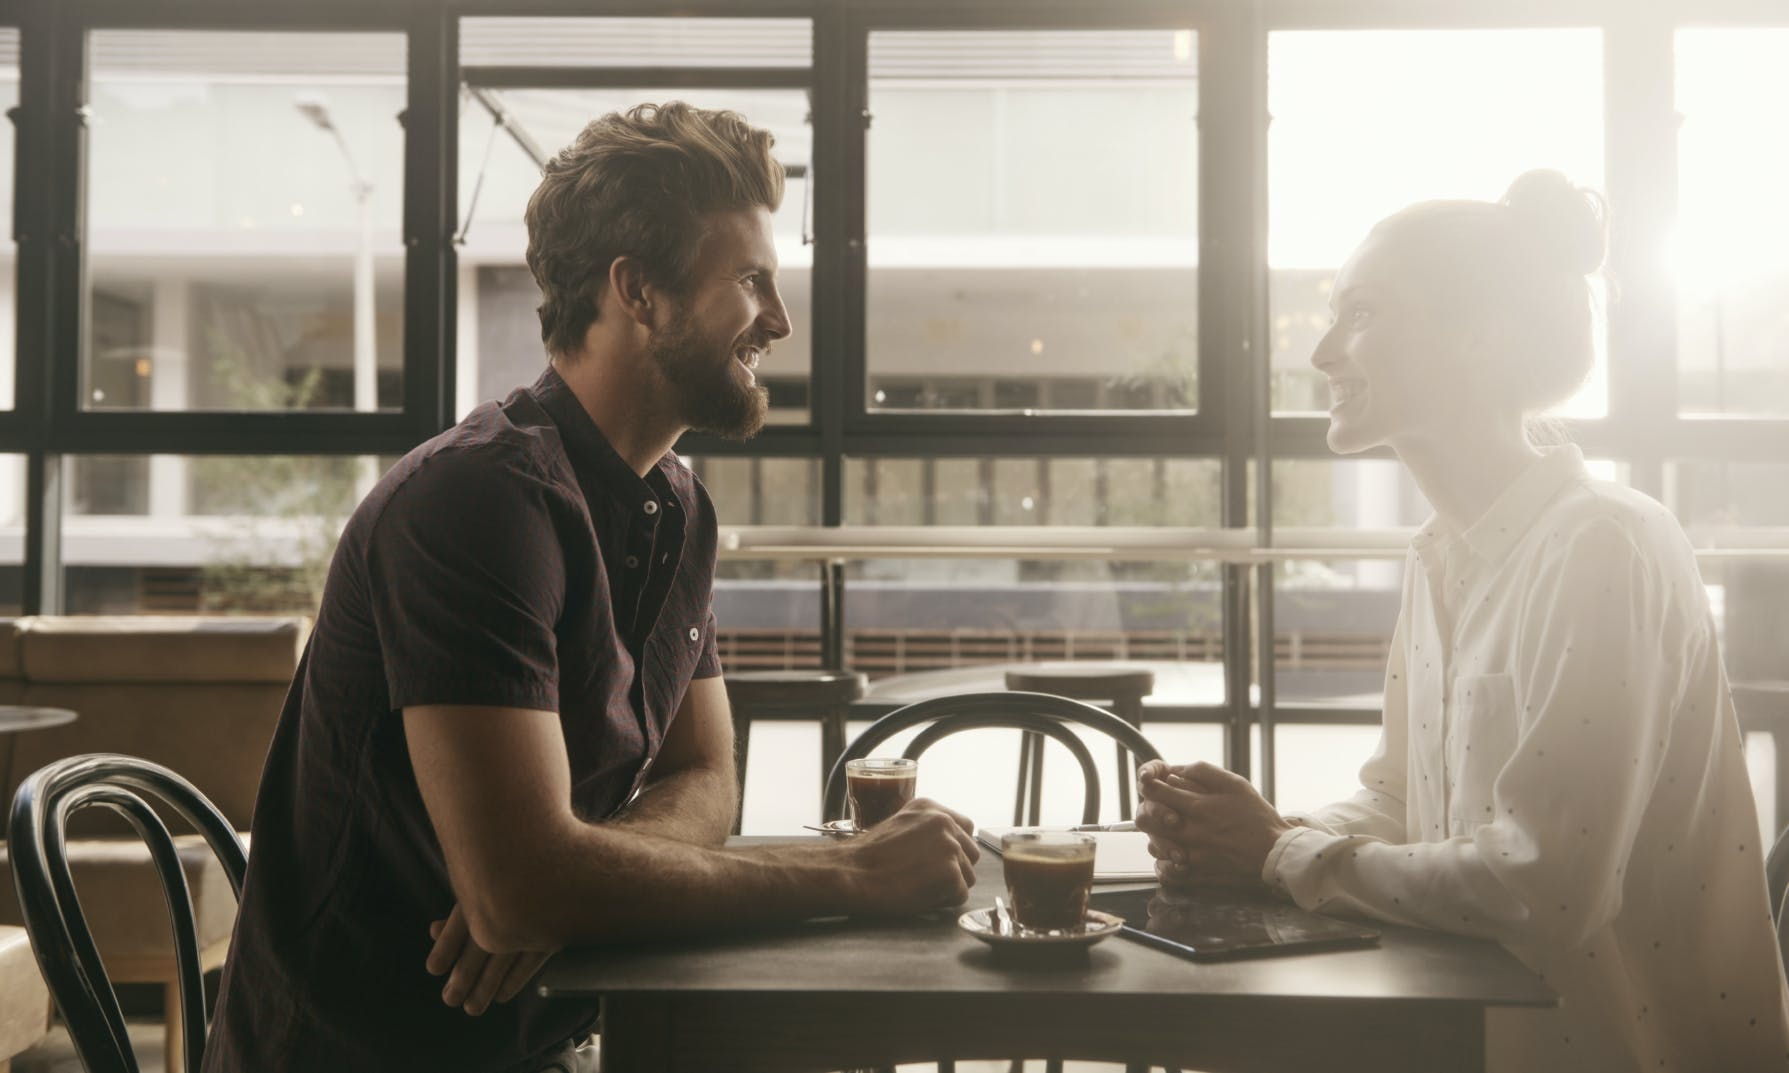 åbent forhold dating for seniorer